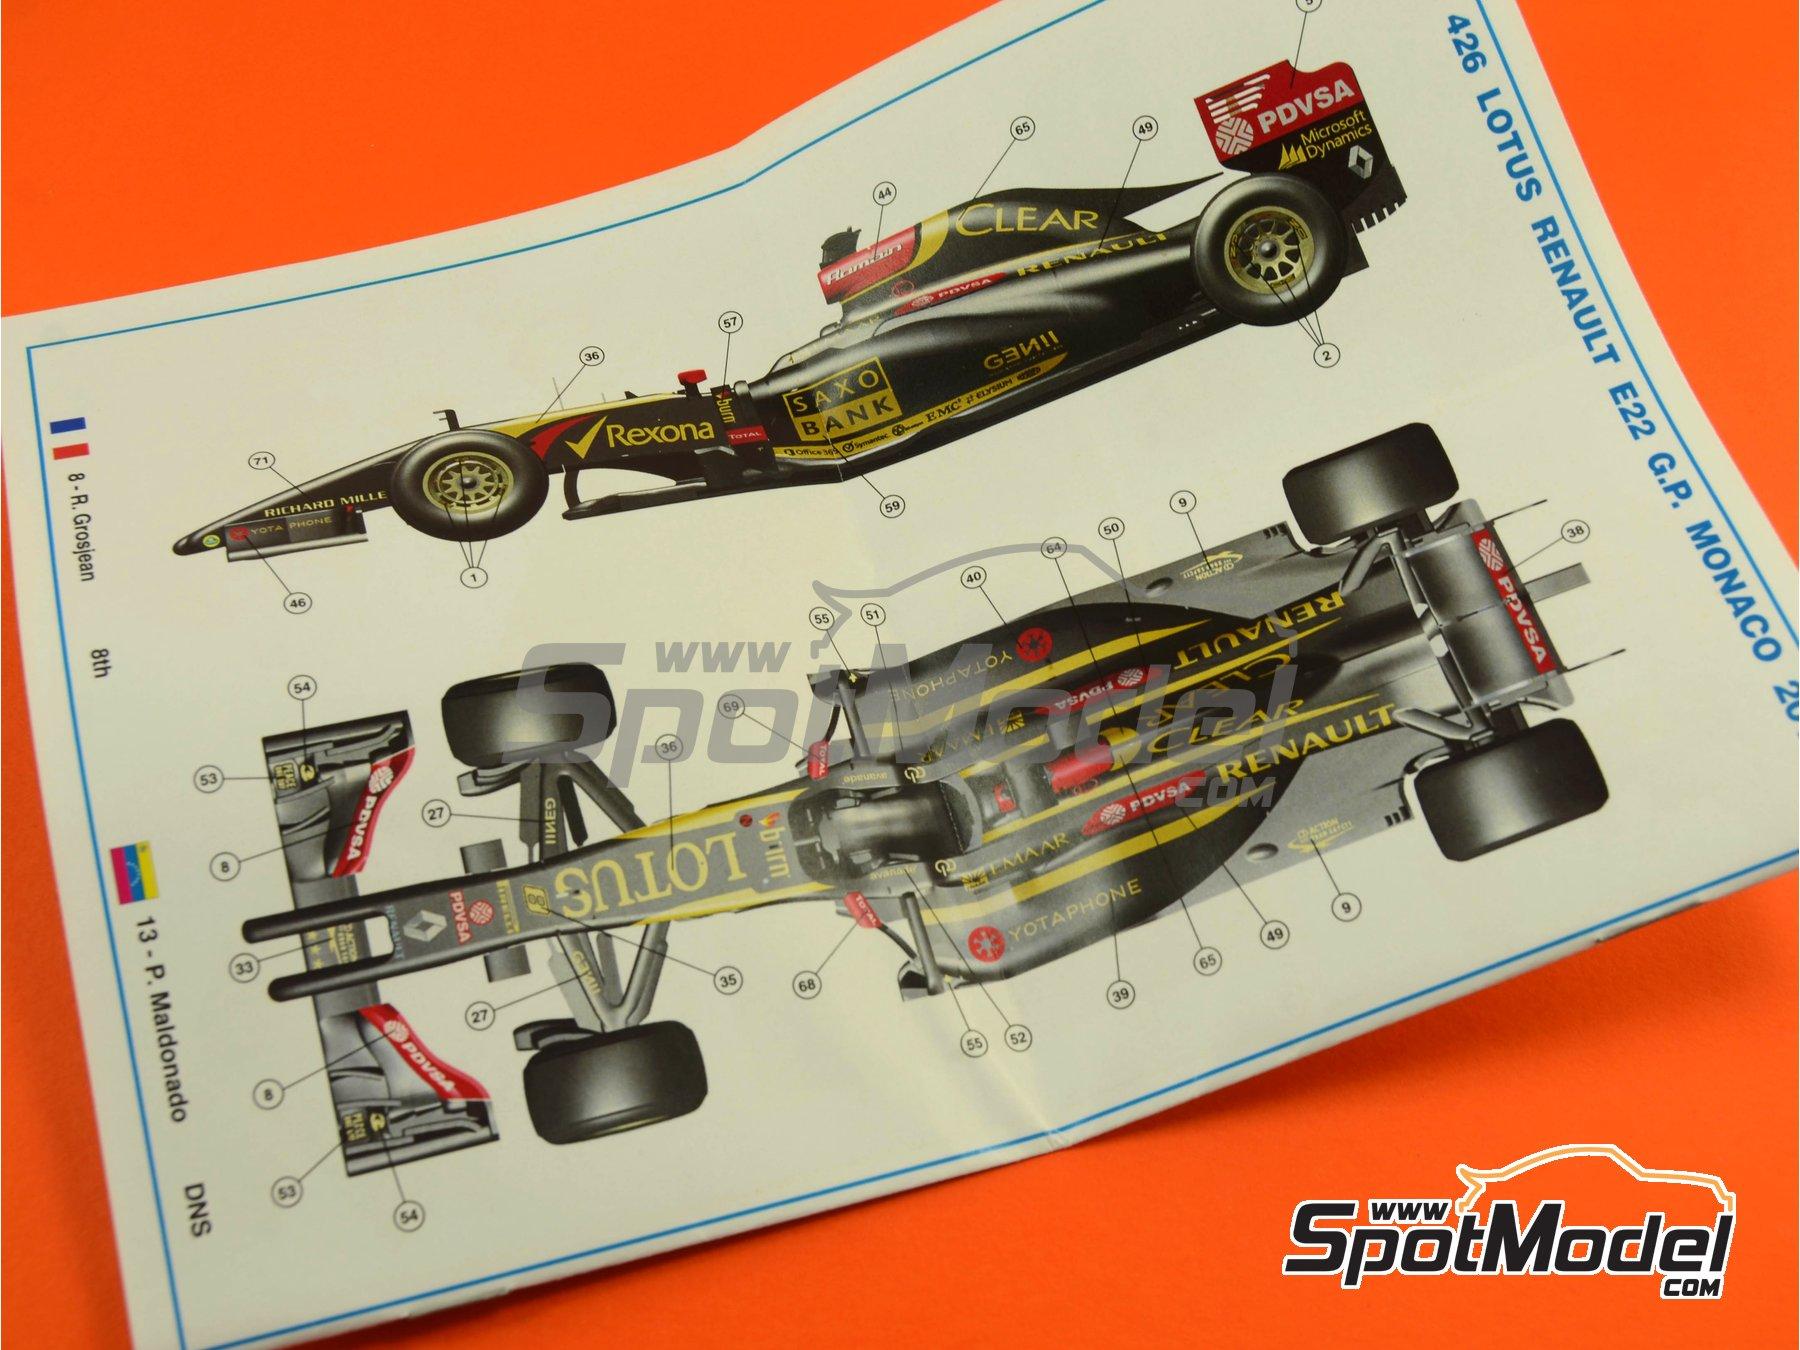 Image 1: Lotus Renault E22 Rexona - Gran Premio de Formula 1 de Mónaco 2014 | Maqueta de coche en escala1/43 fabricado por Tameo Kits (ref.TMK426)